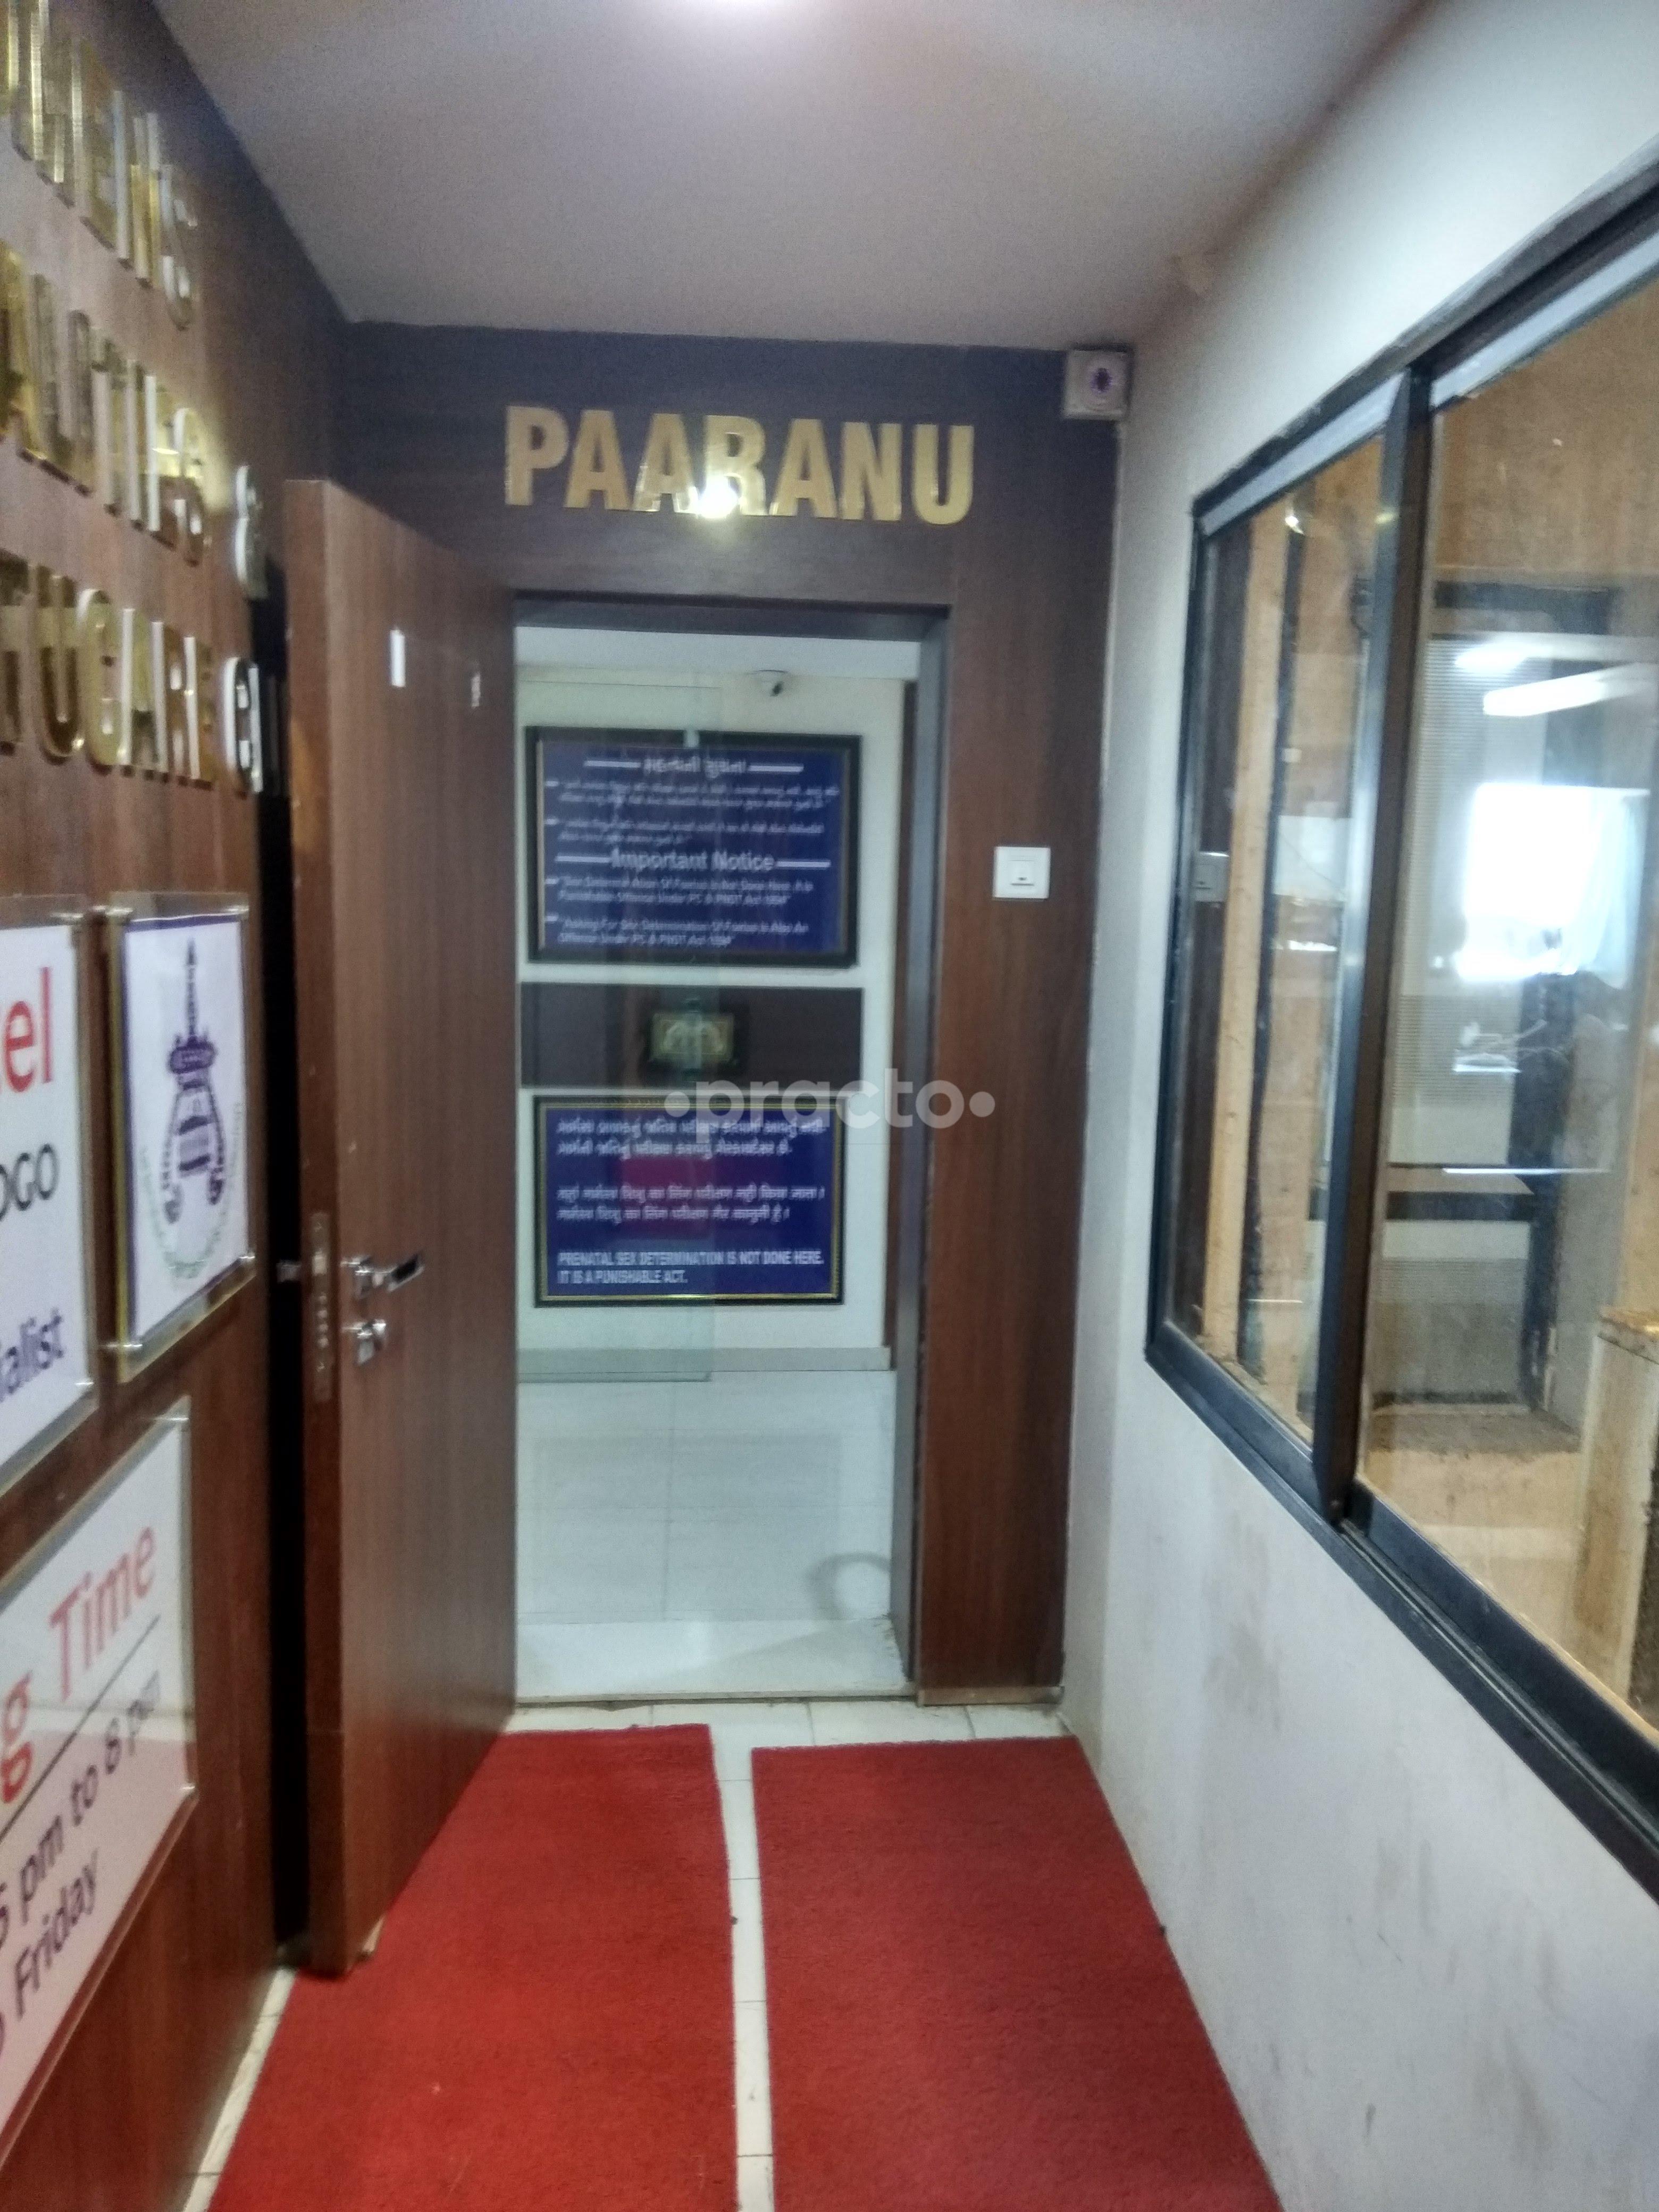 Paaranu Test Tube Baby Center